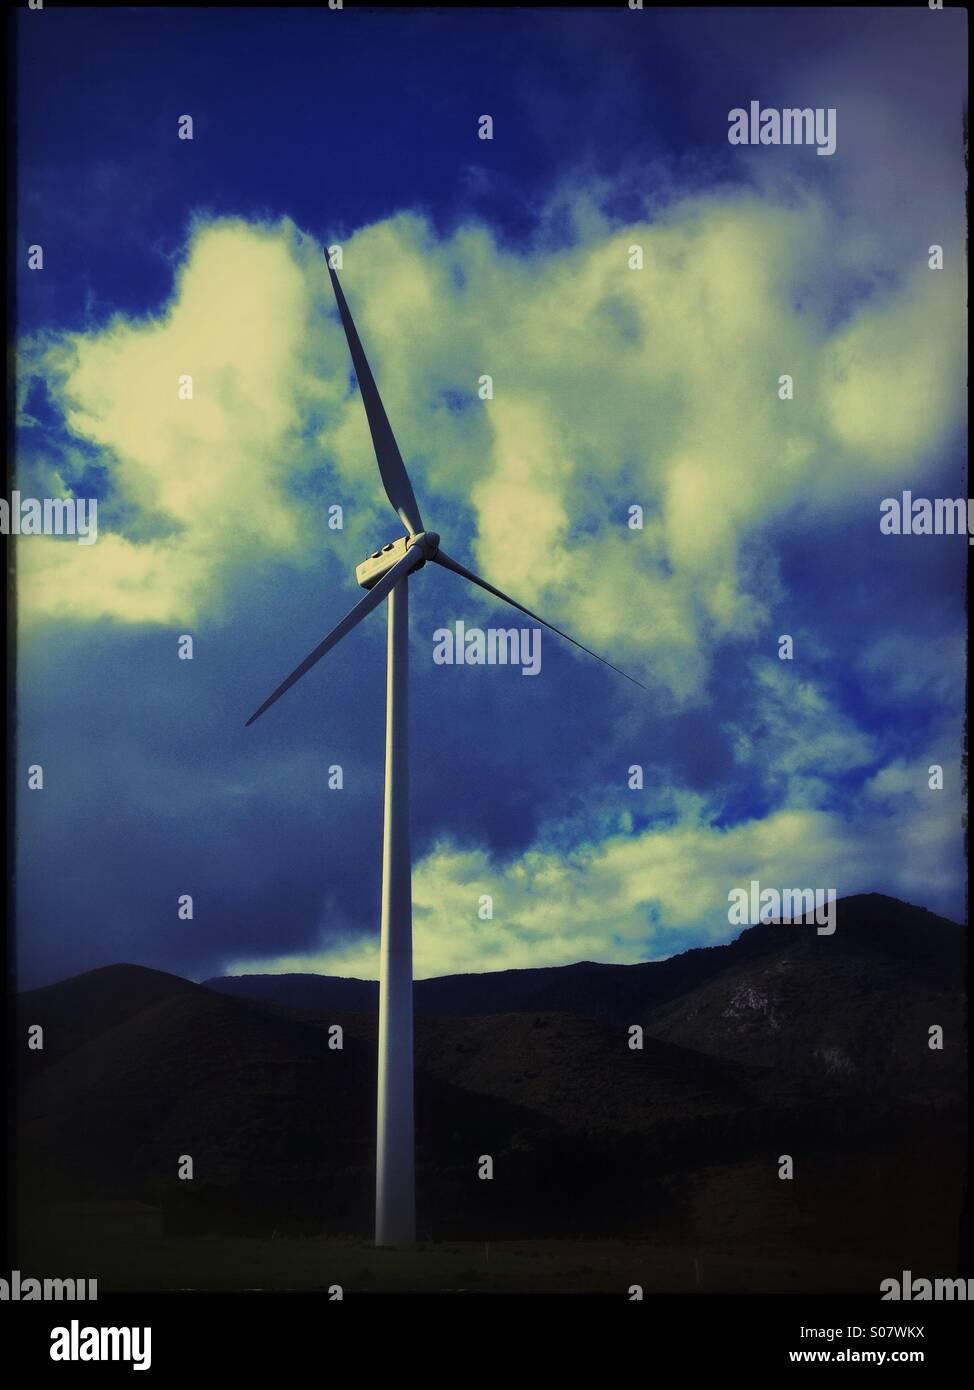 Windmill, Spain. - Stock Image